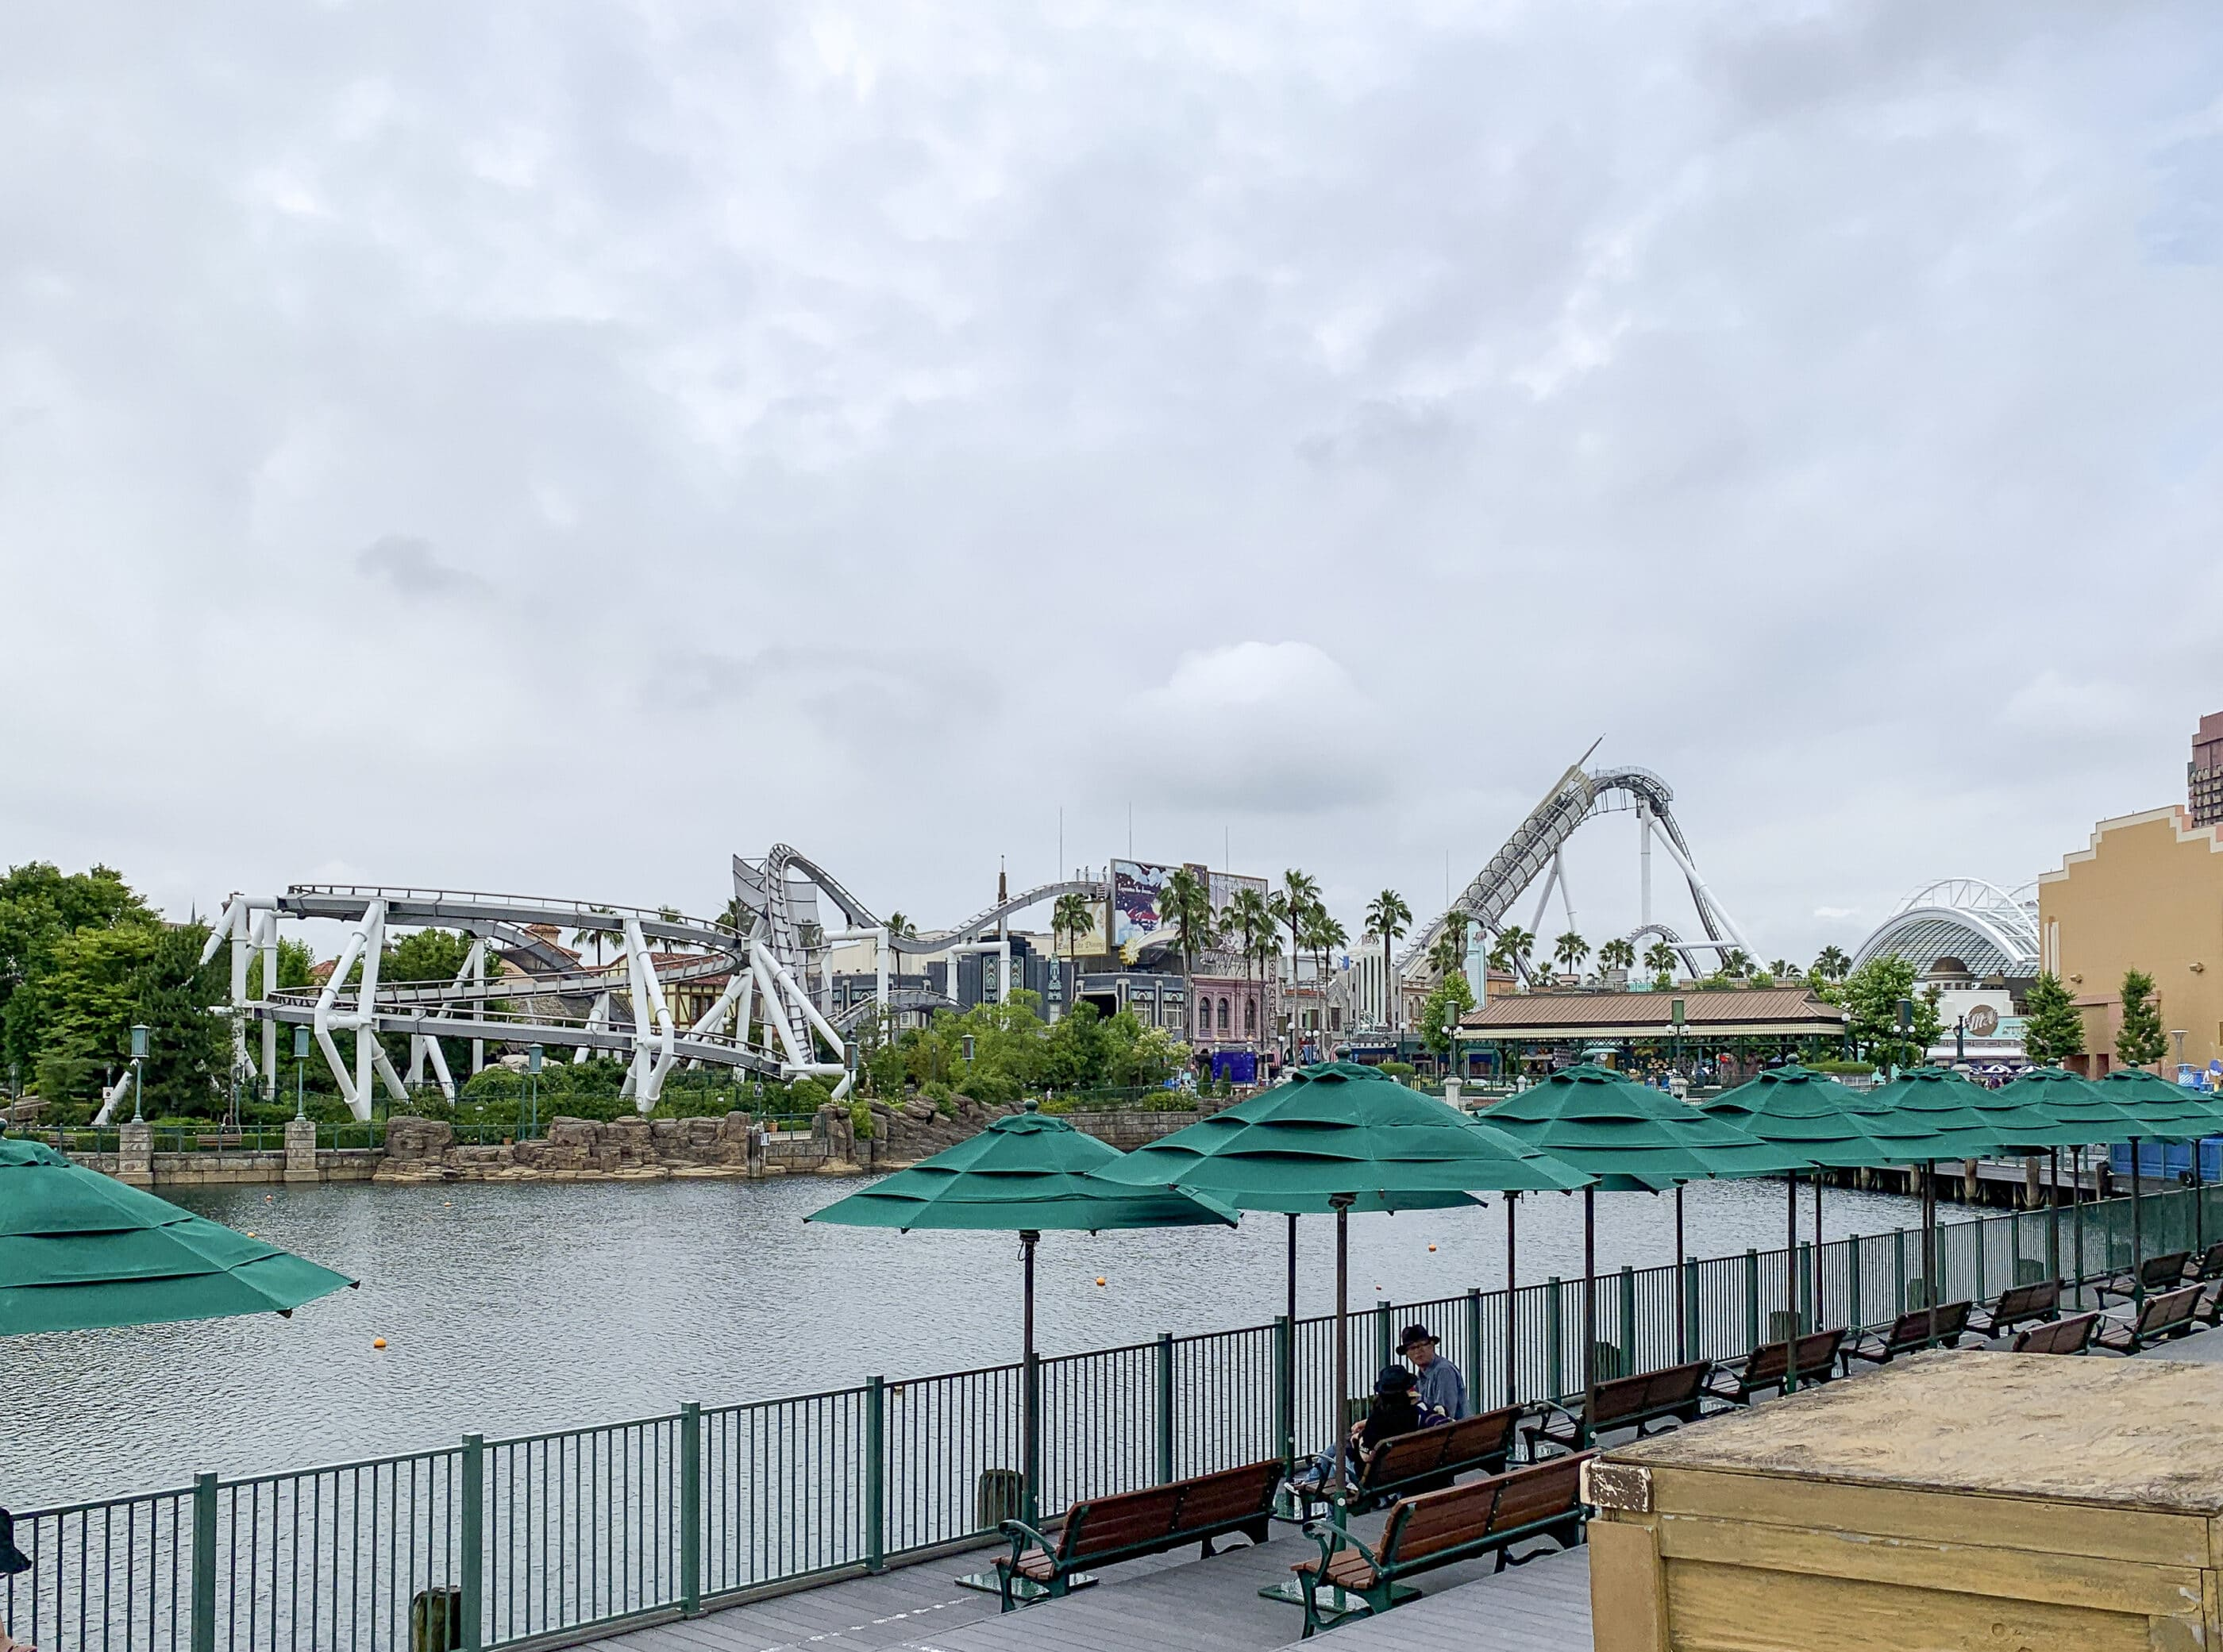 Hollywood Dream roller coaster at Universal Studios Japan.